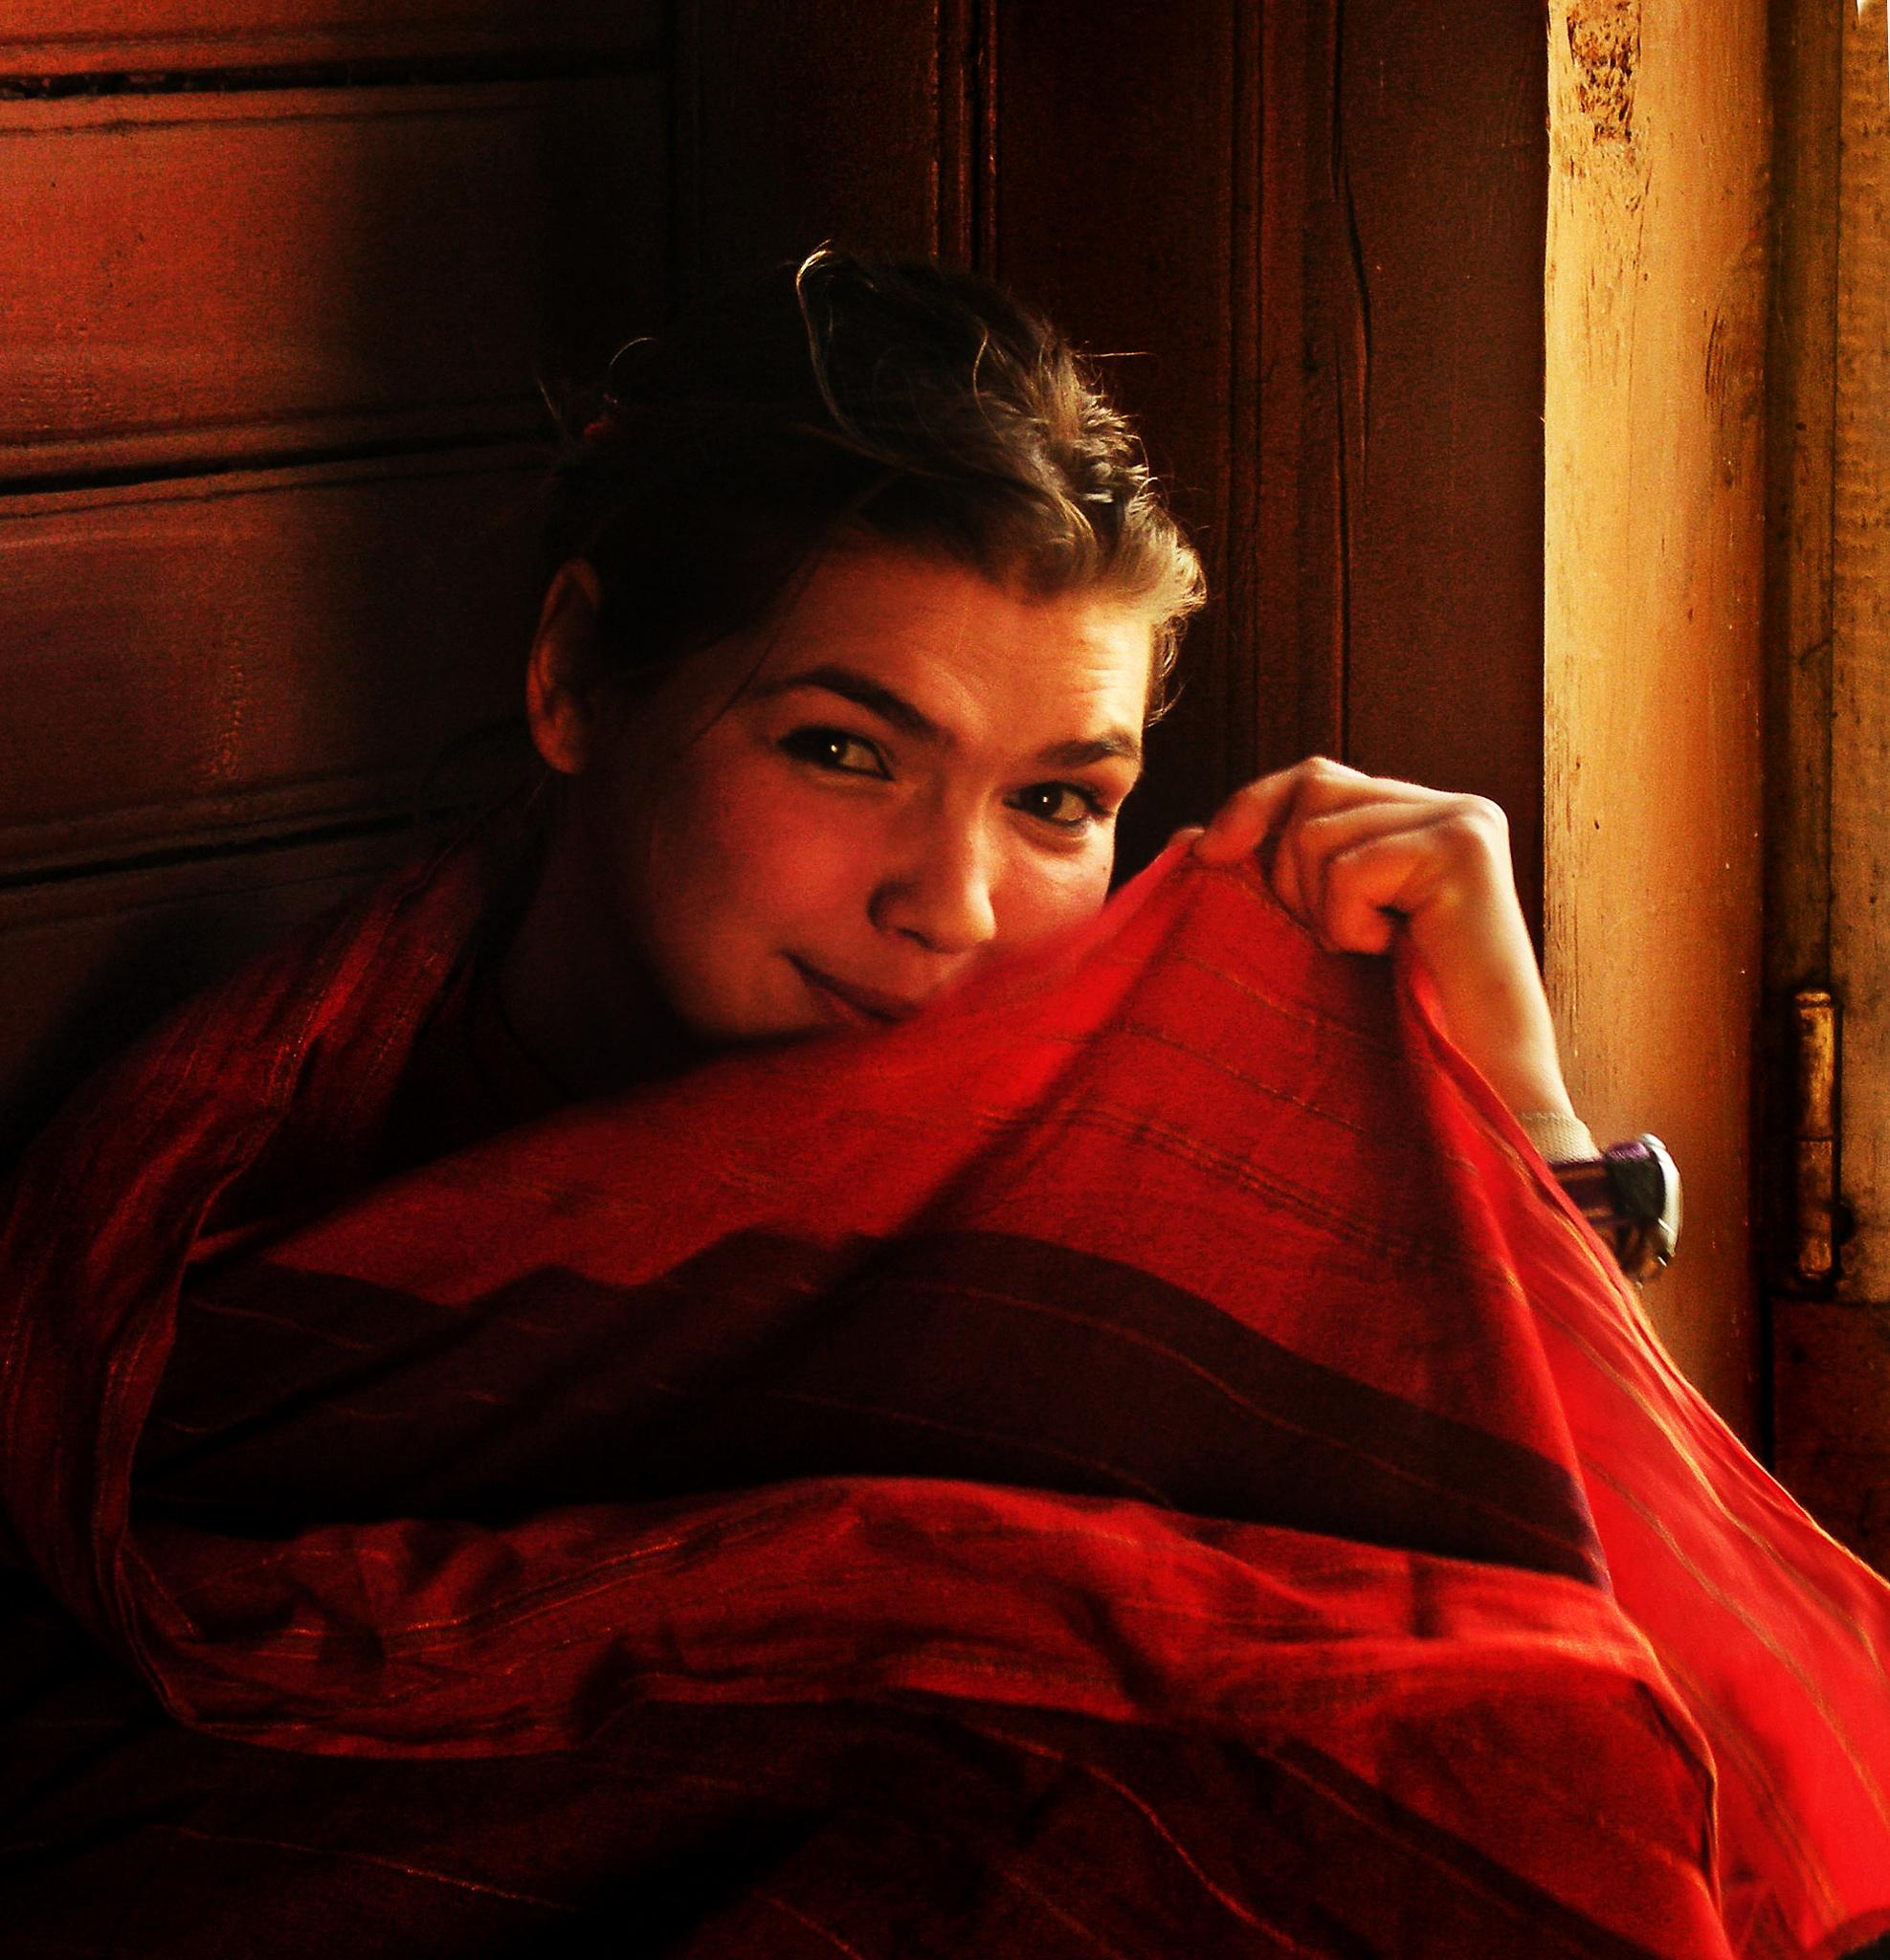 Masyanya and red plaid by Сергей Юрьев